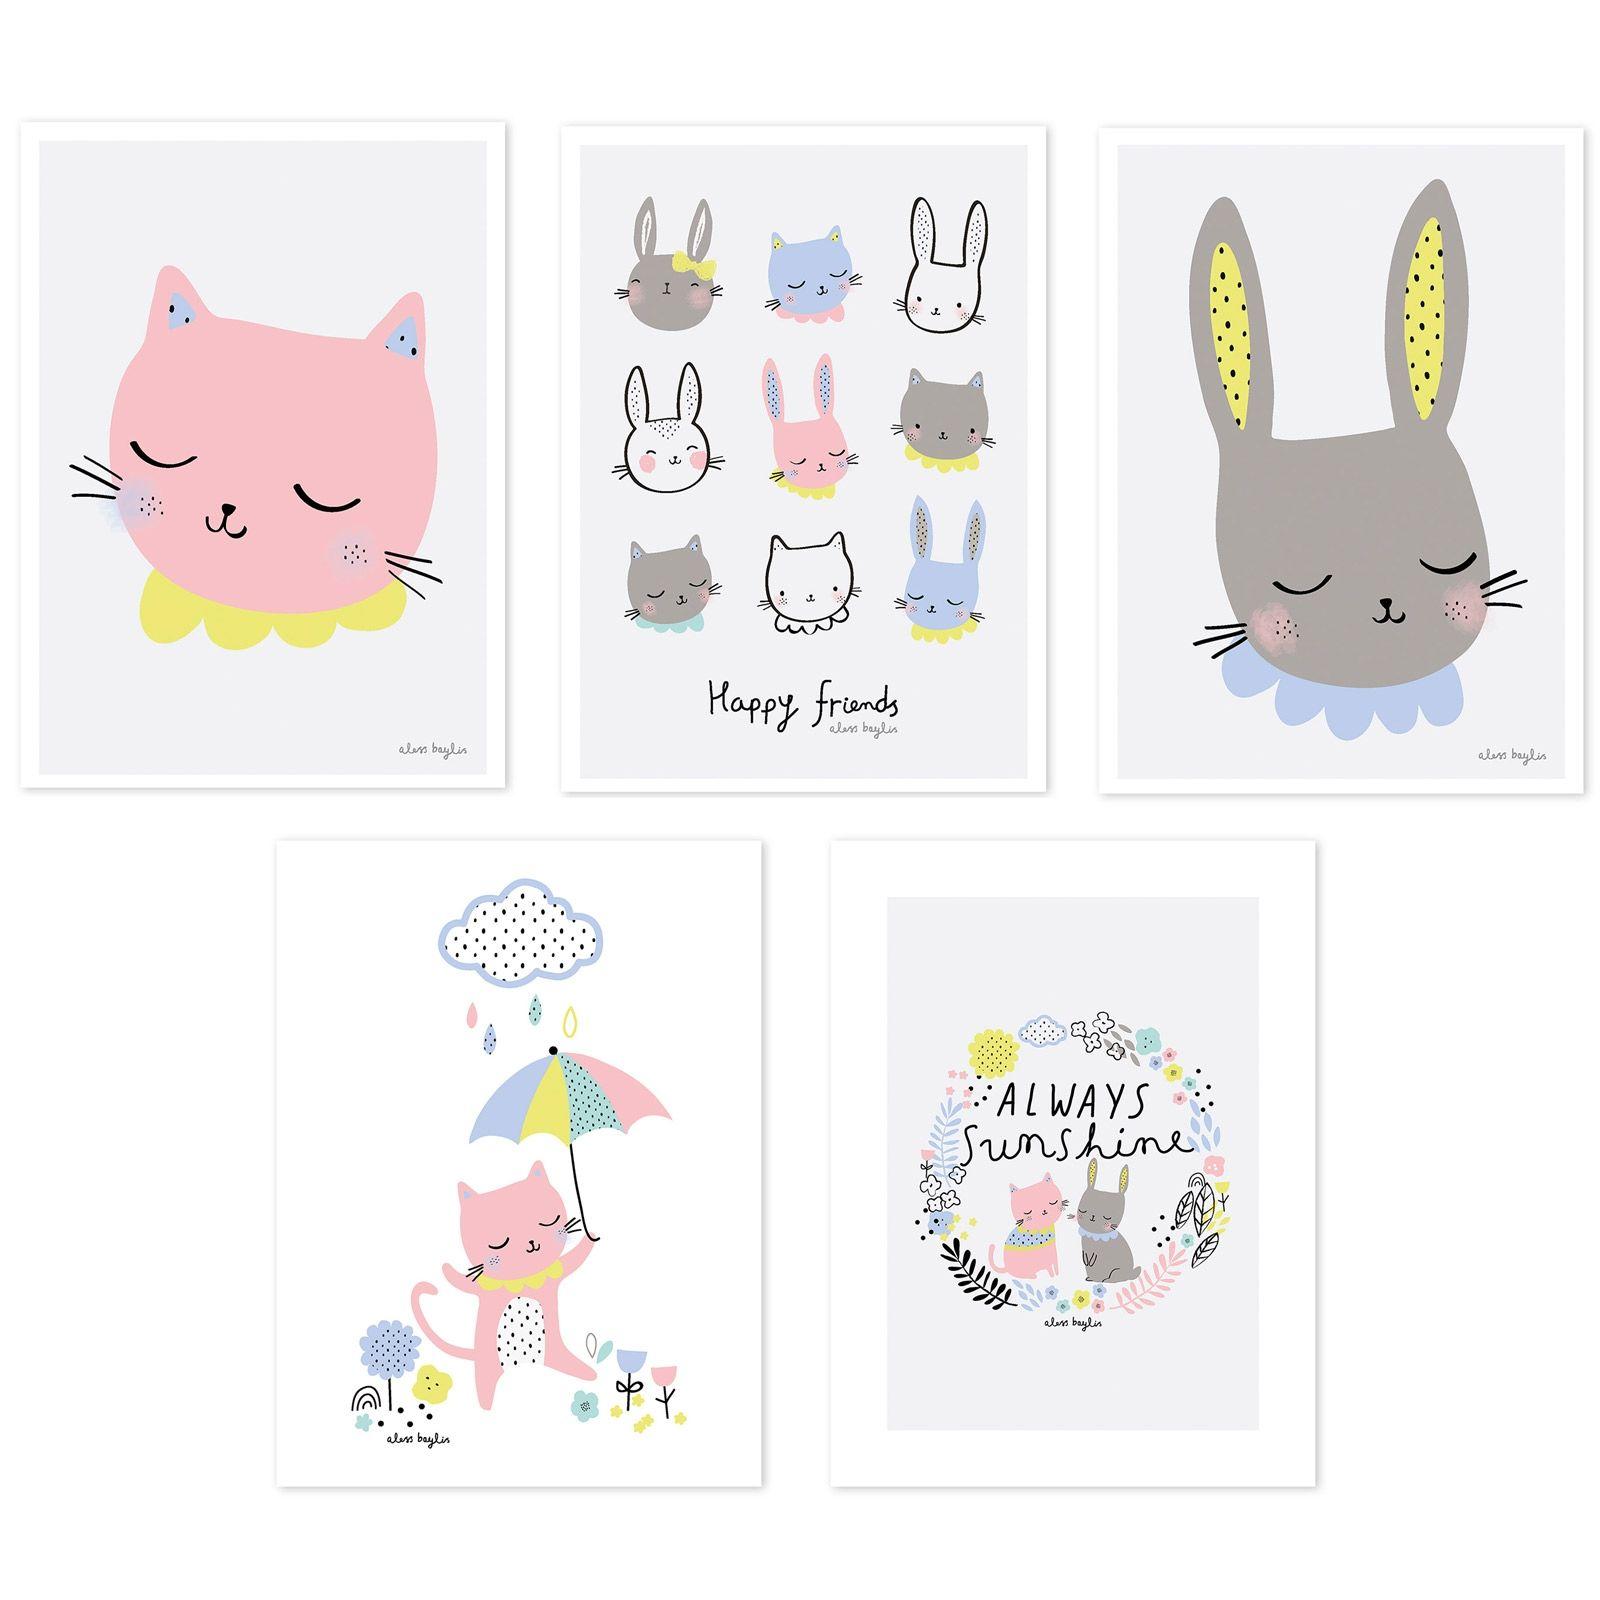 Ce lot de 5 posters Happy clouds by Aless Baylis pour Lilipinso